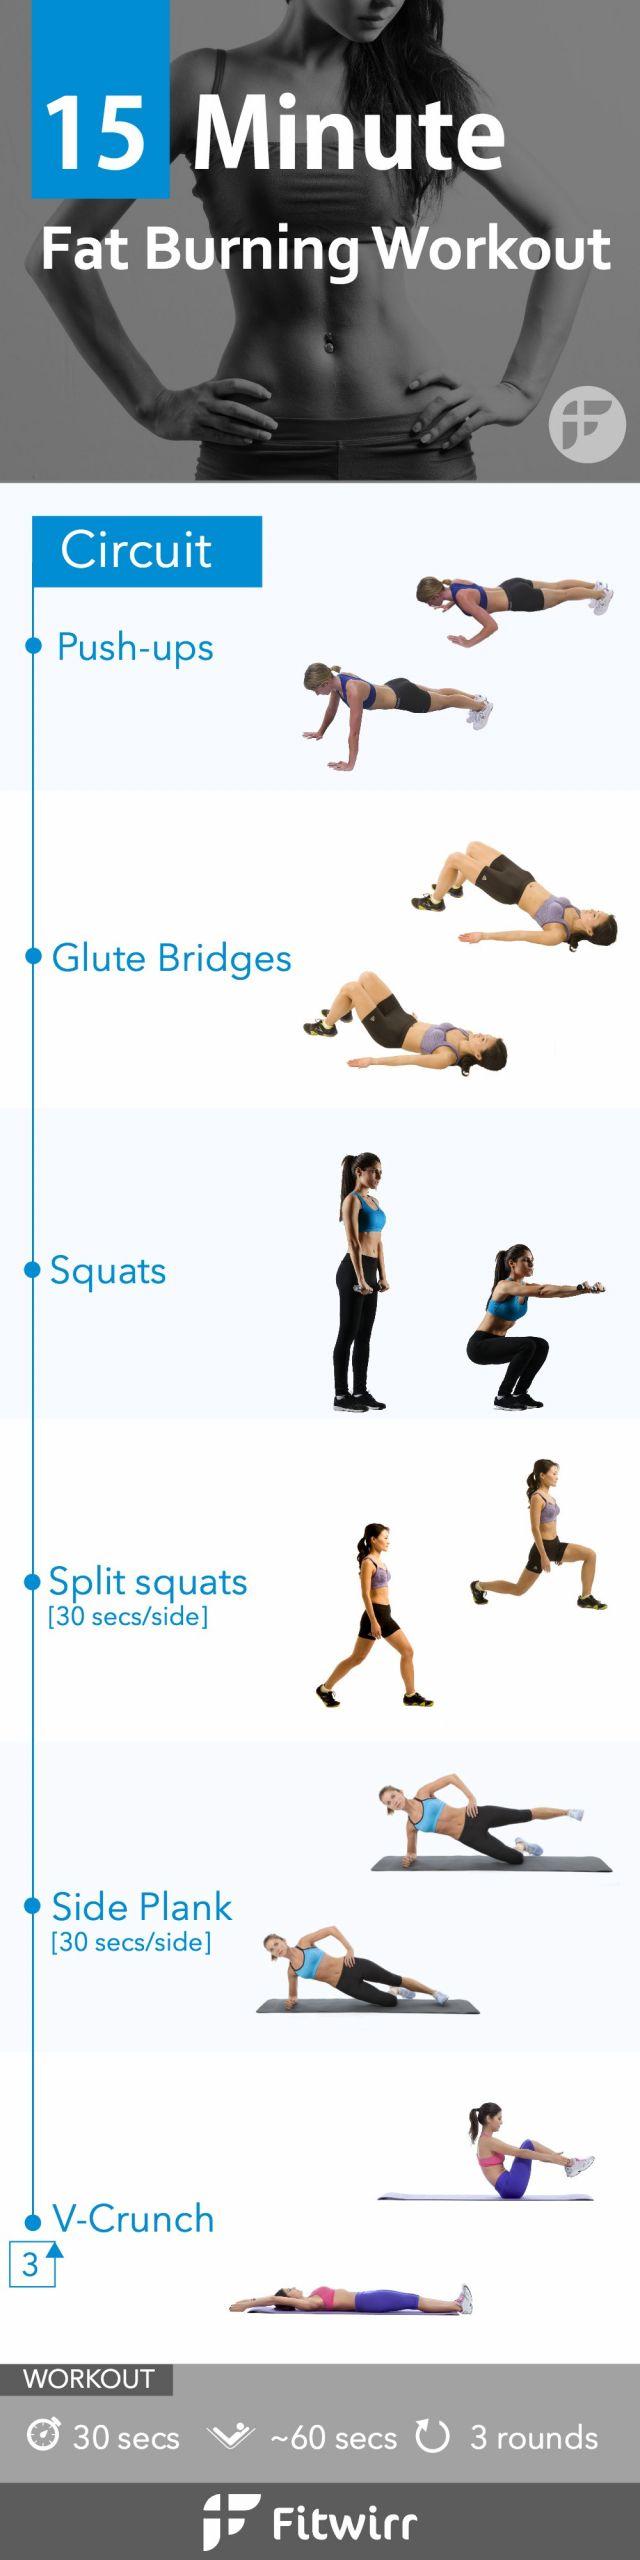 Fat Burning Workout Tiktok  15 Minute Bodyweight Fat Loss Workout for Women